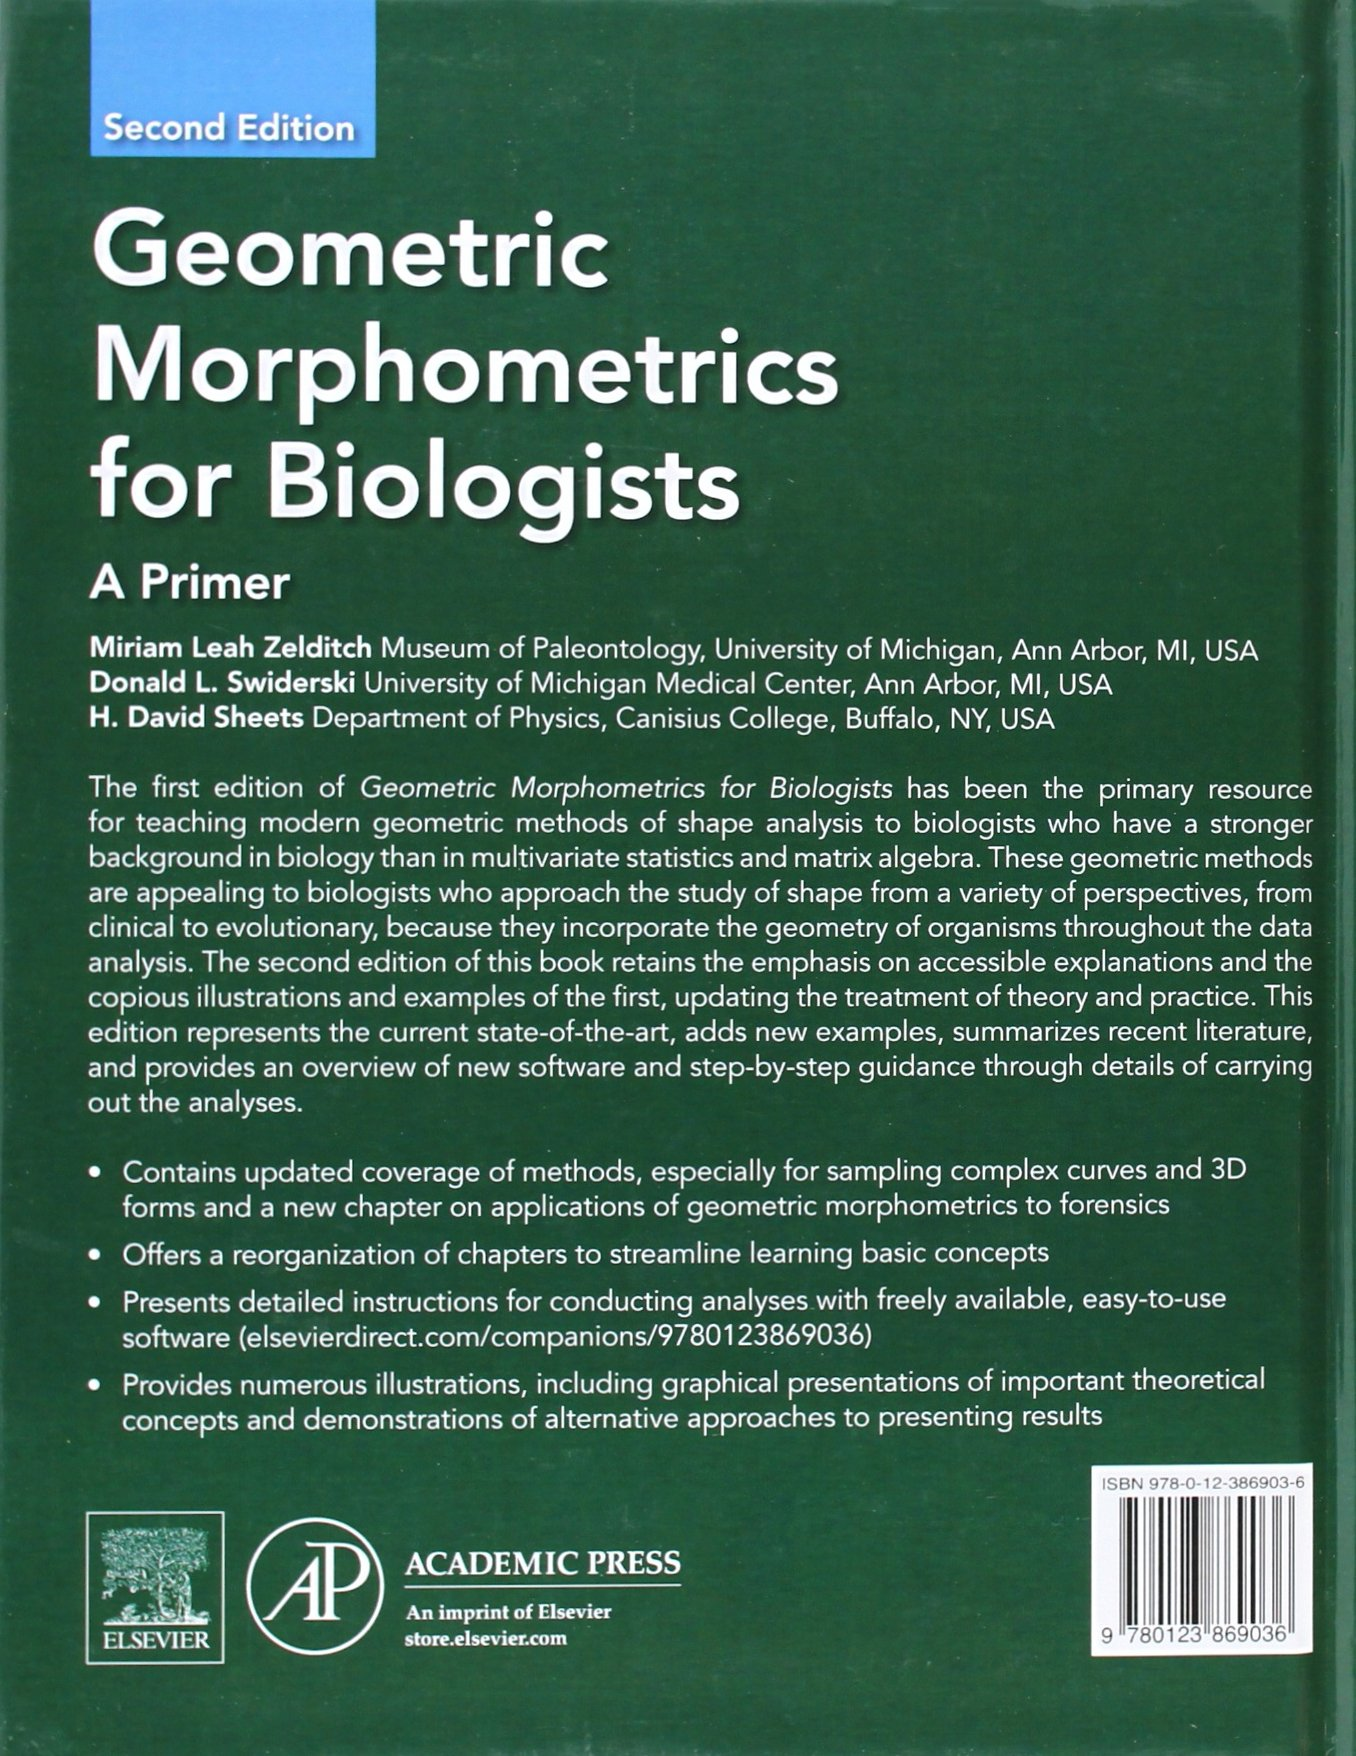 Geometric Morphometrics for Biologists: A Primer: Amazon.es: Miriam ...